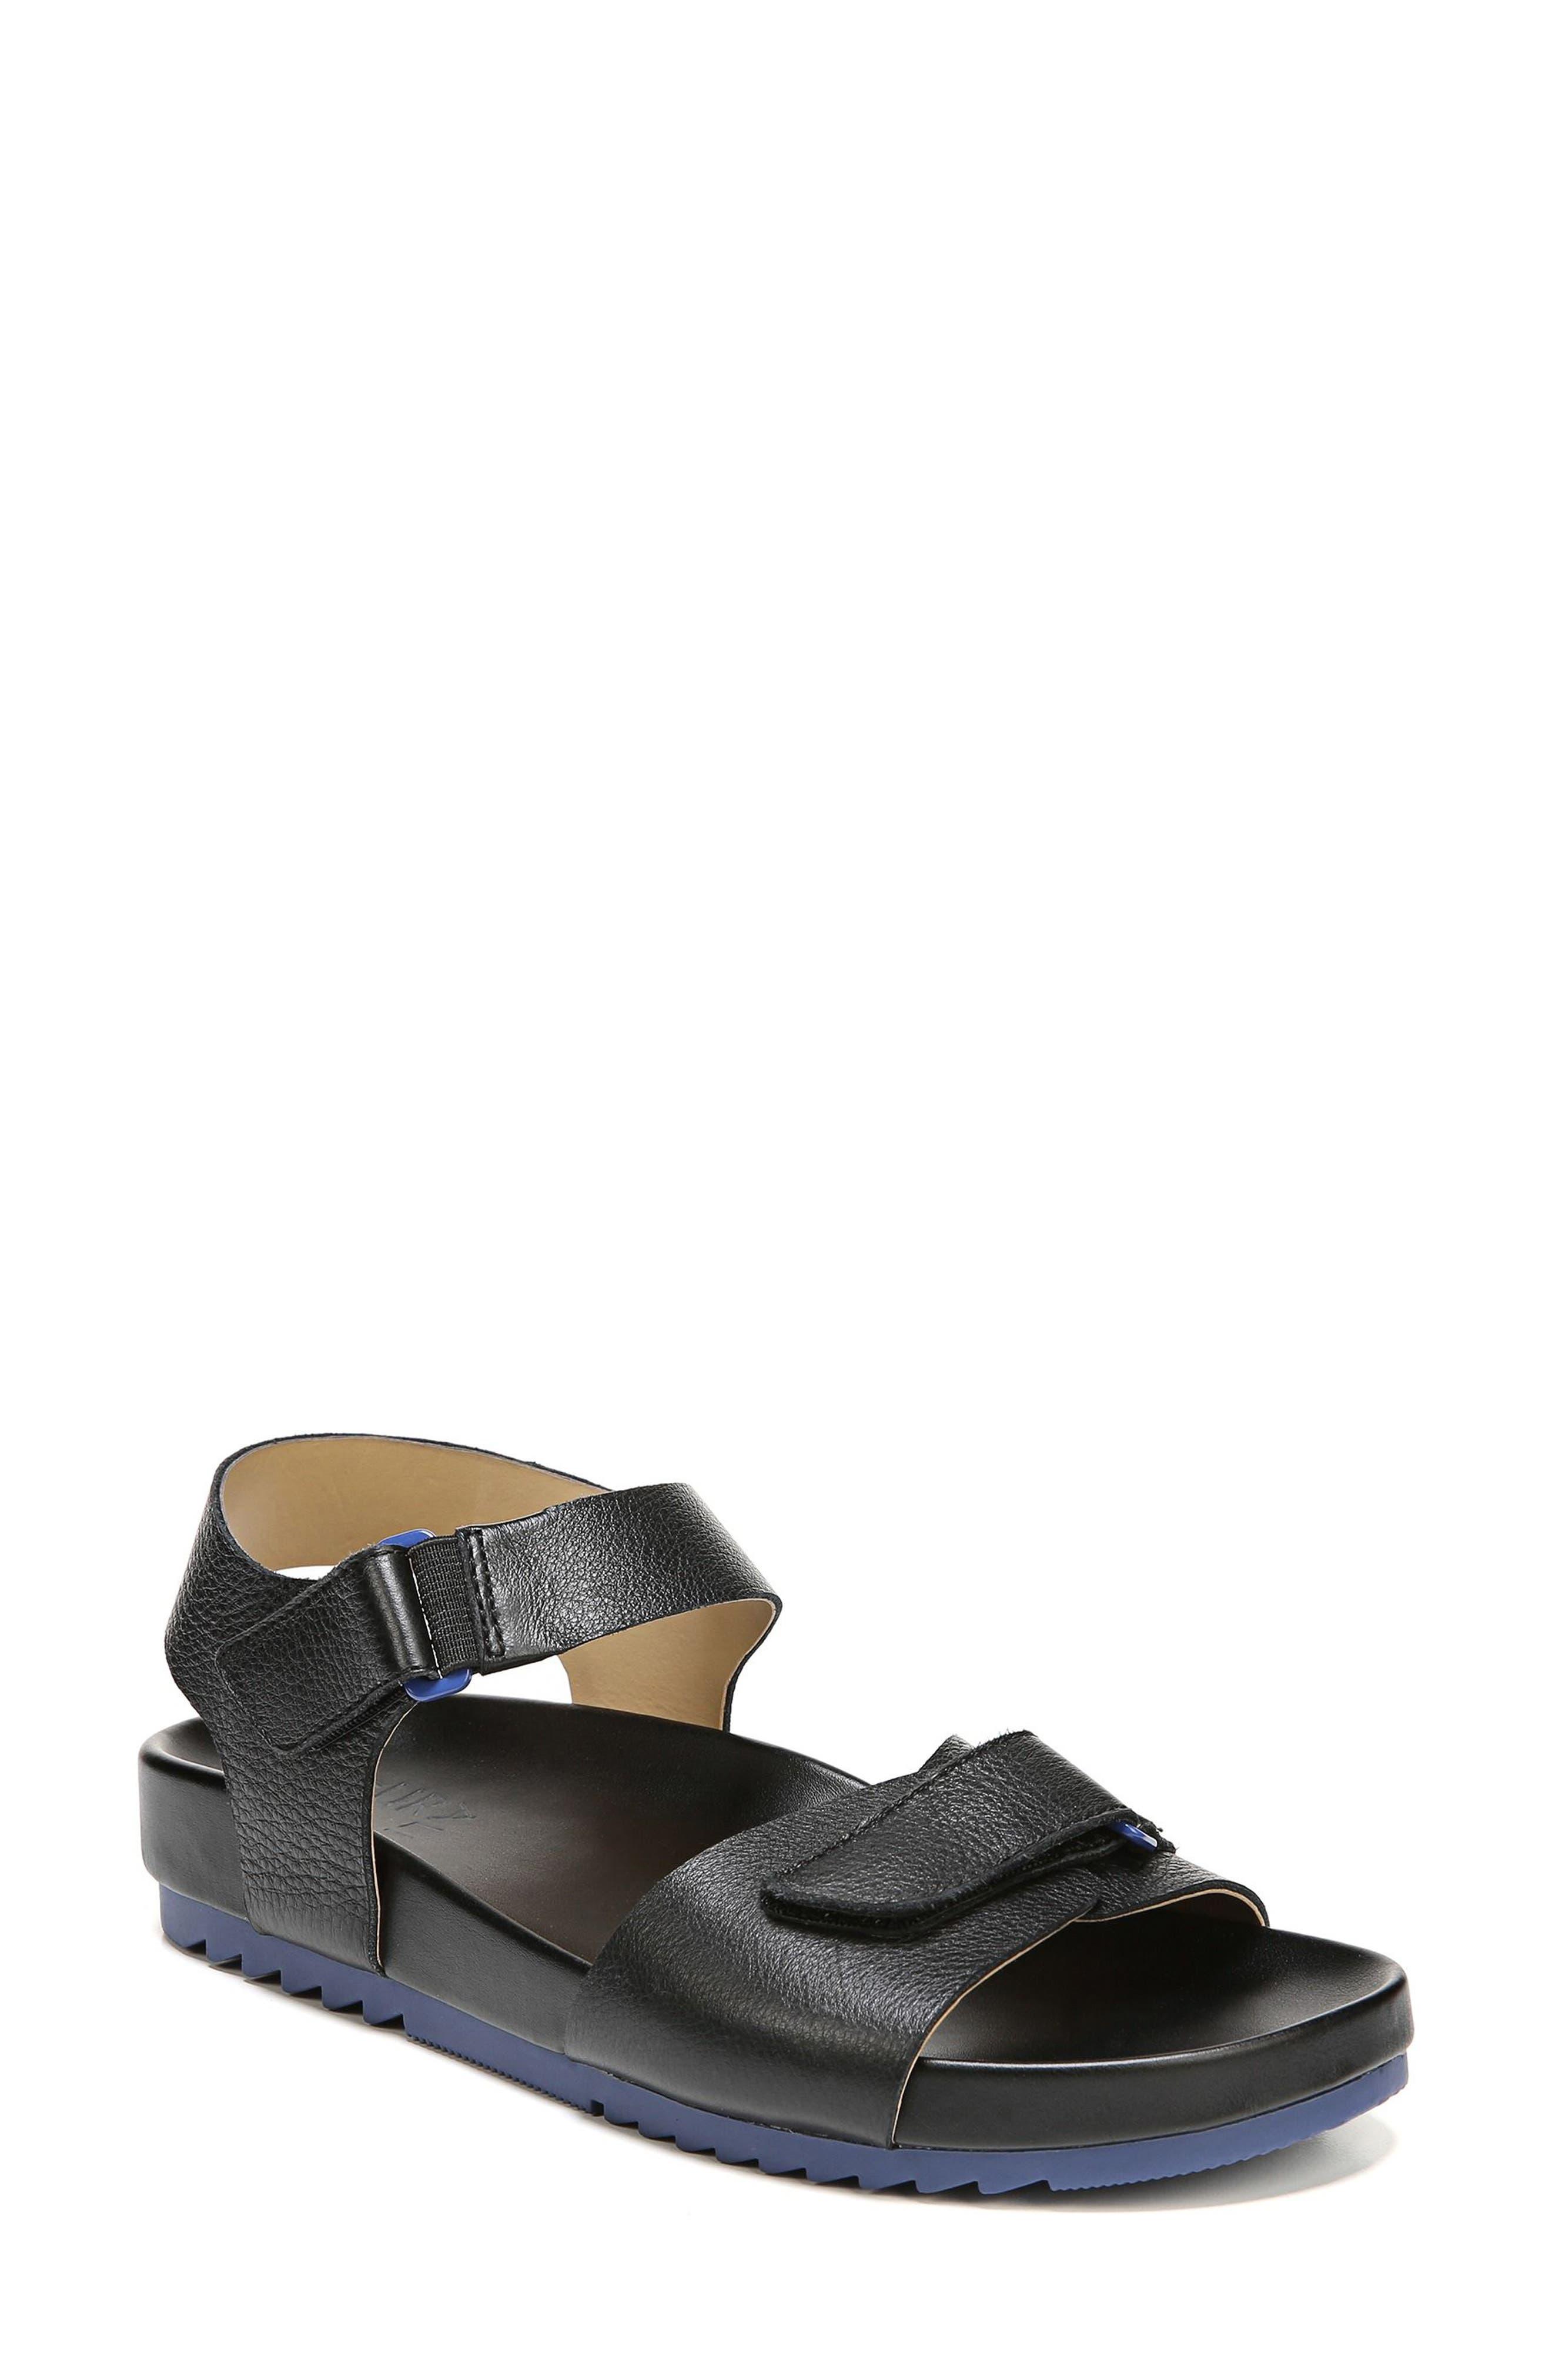 Ari Sandal,                         Main,                         color, Black Pebble Leather